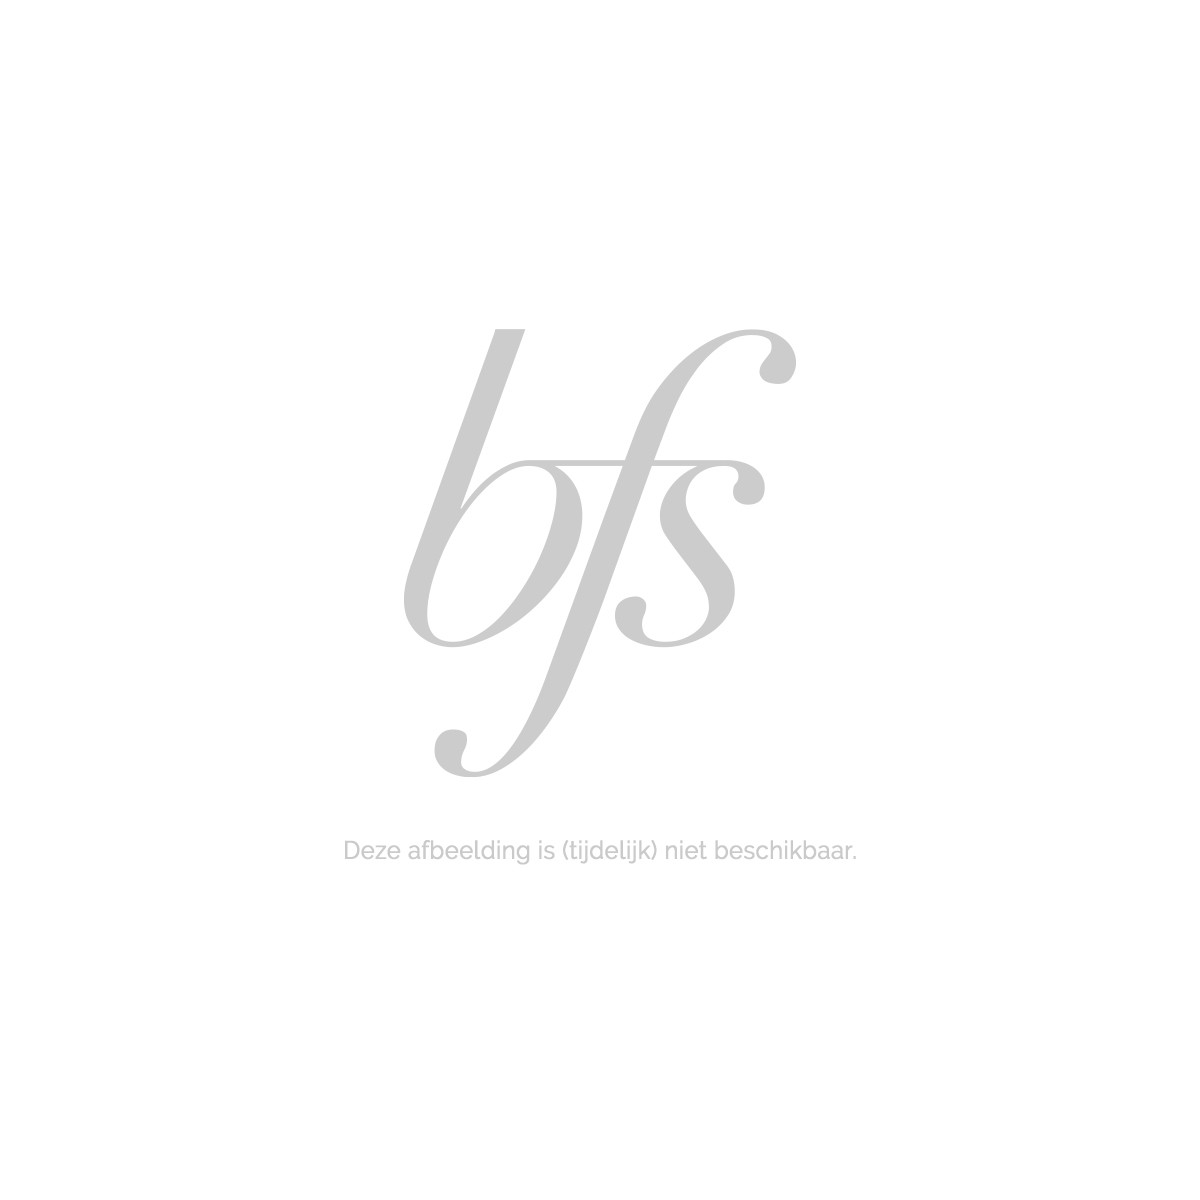 Ibp Stiletto Edge Tips Clear 100 Pcs